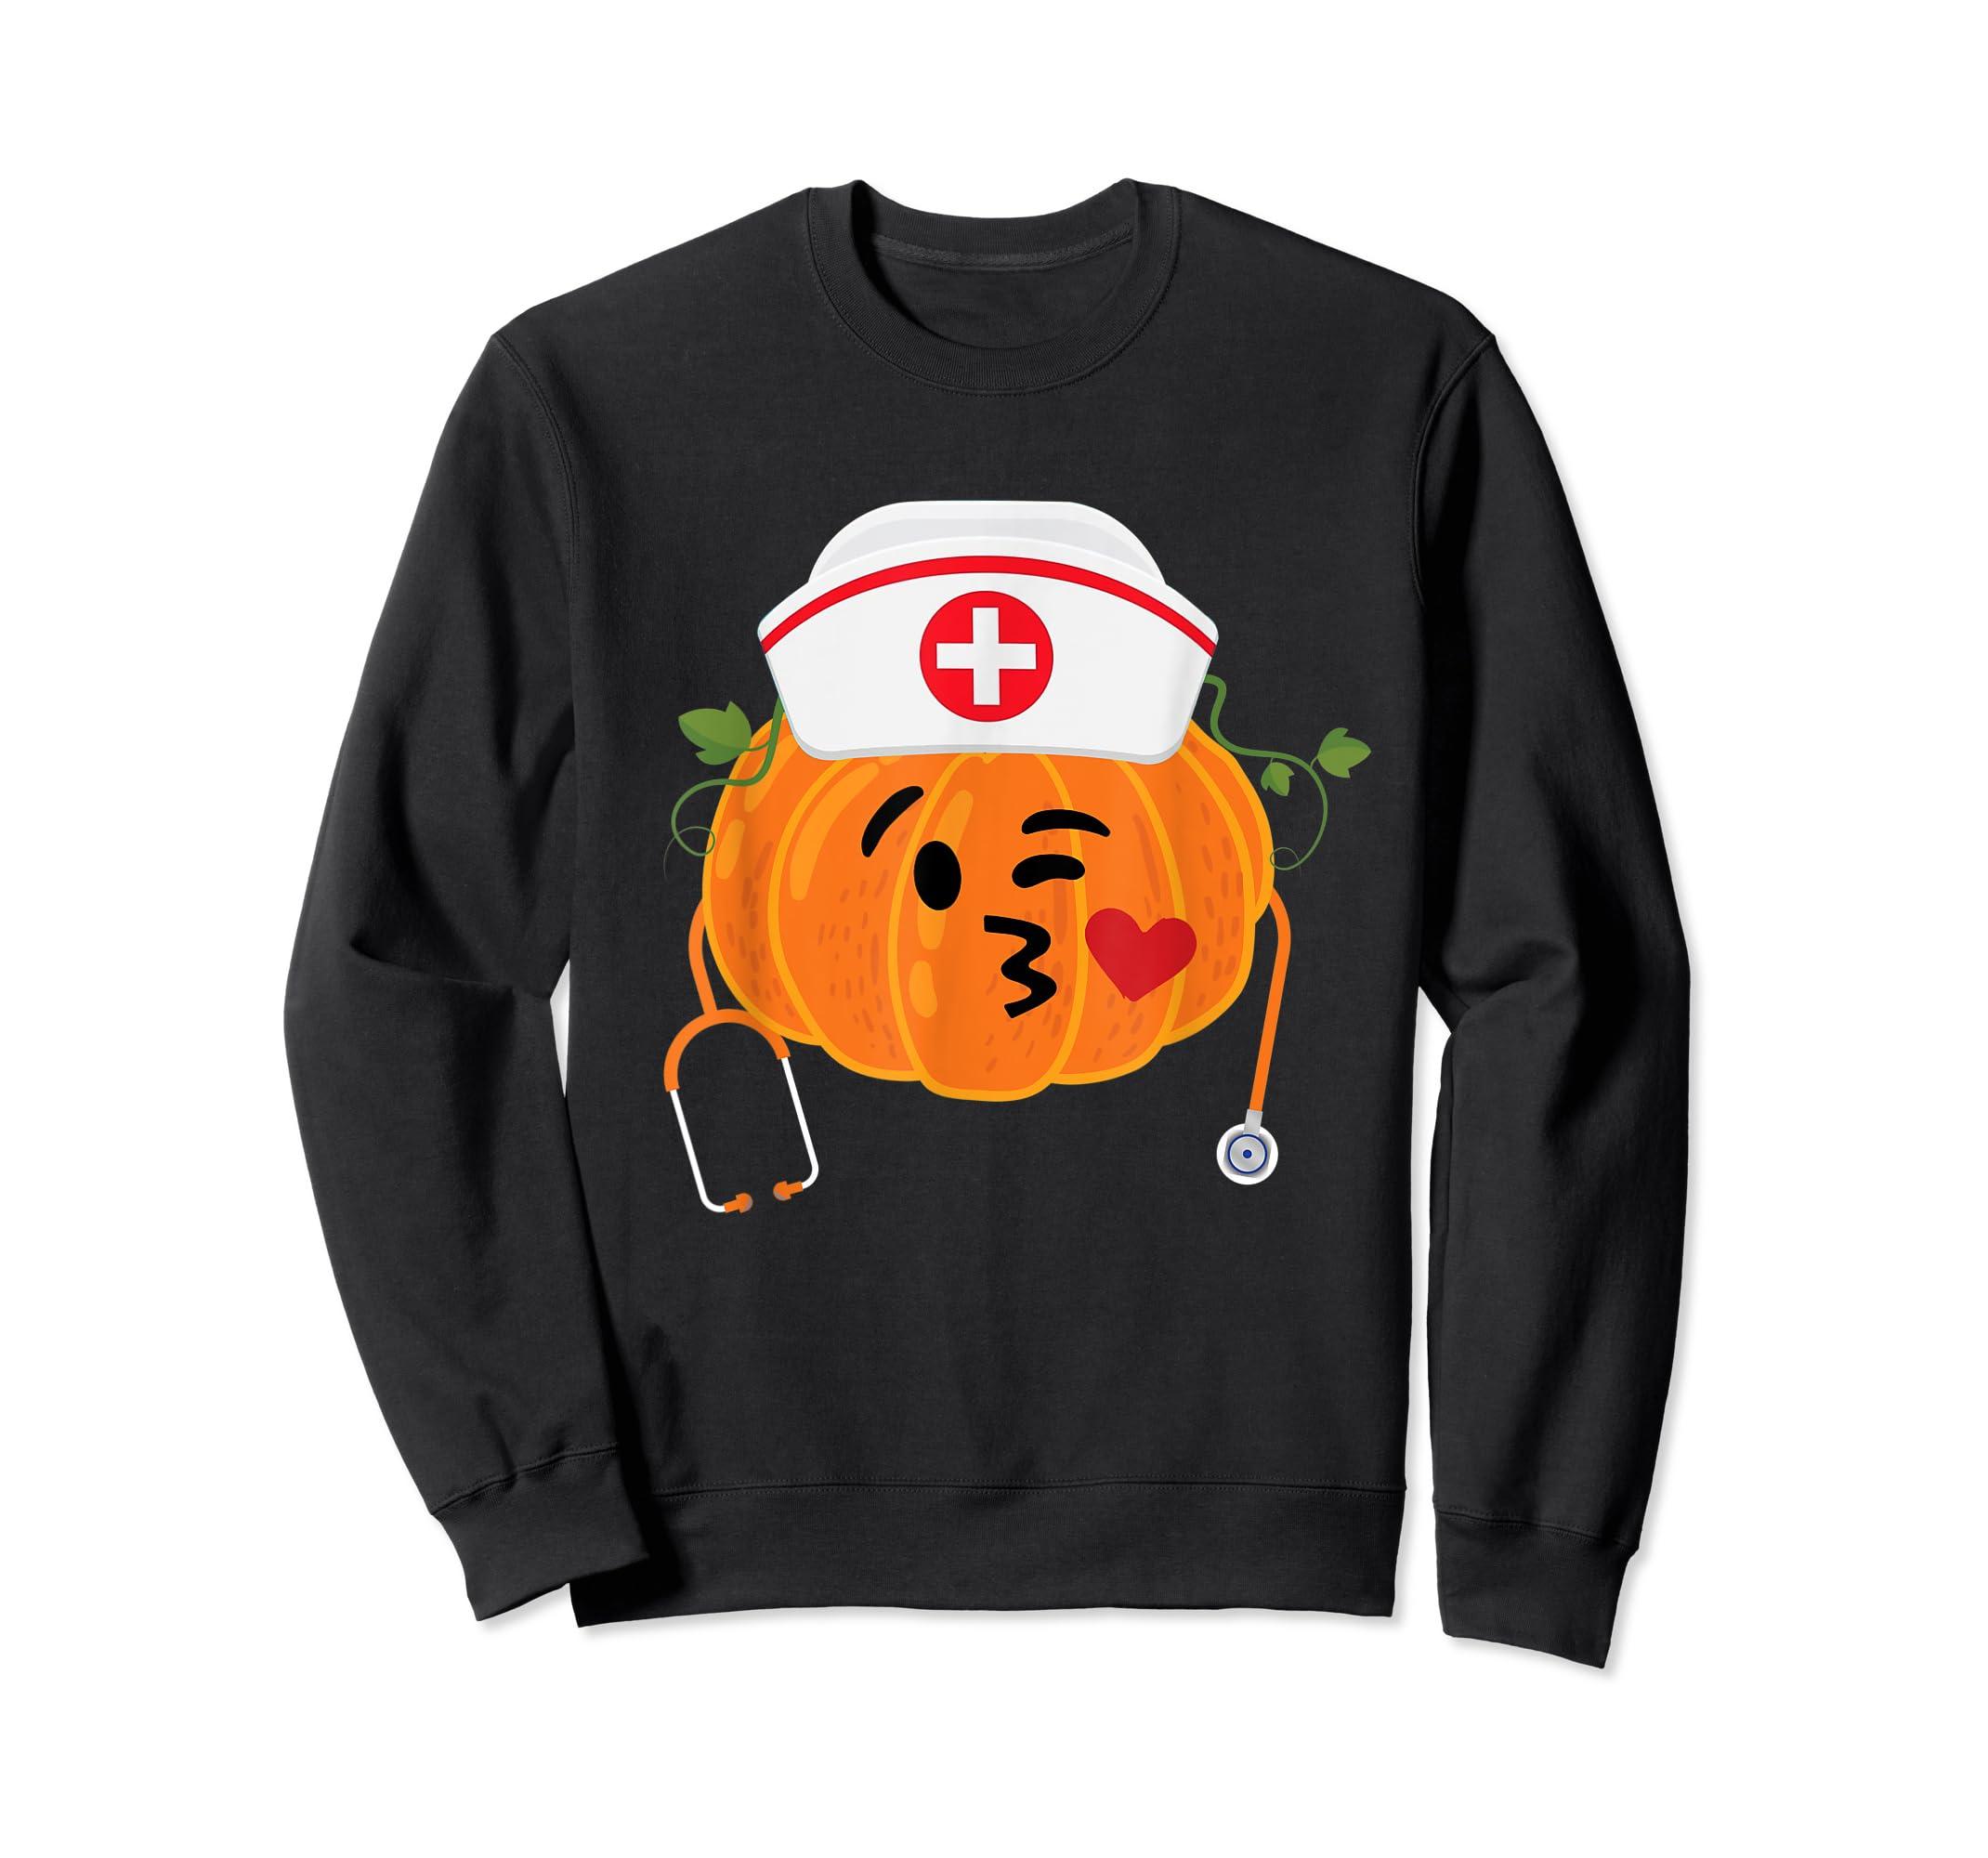 Nurse Stethoscope Pumpkin Funny Nursing Halloween Gift T-Shirt-Sweatshirt-Black